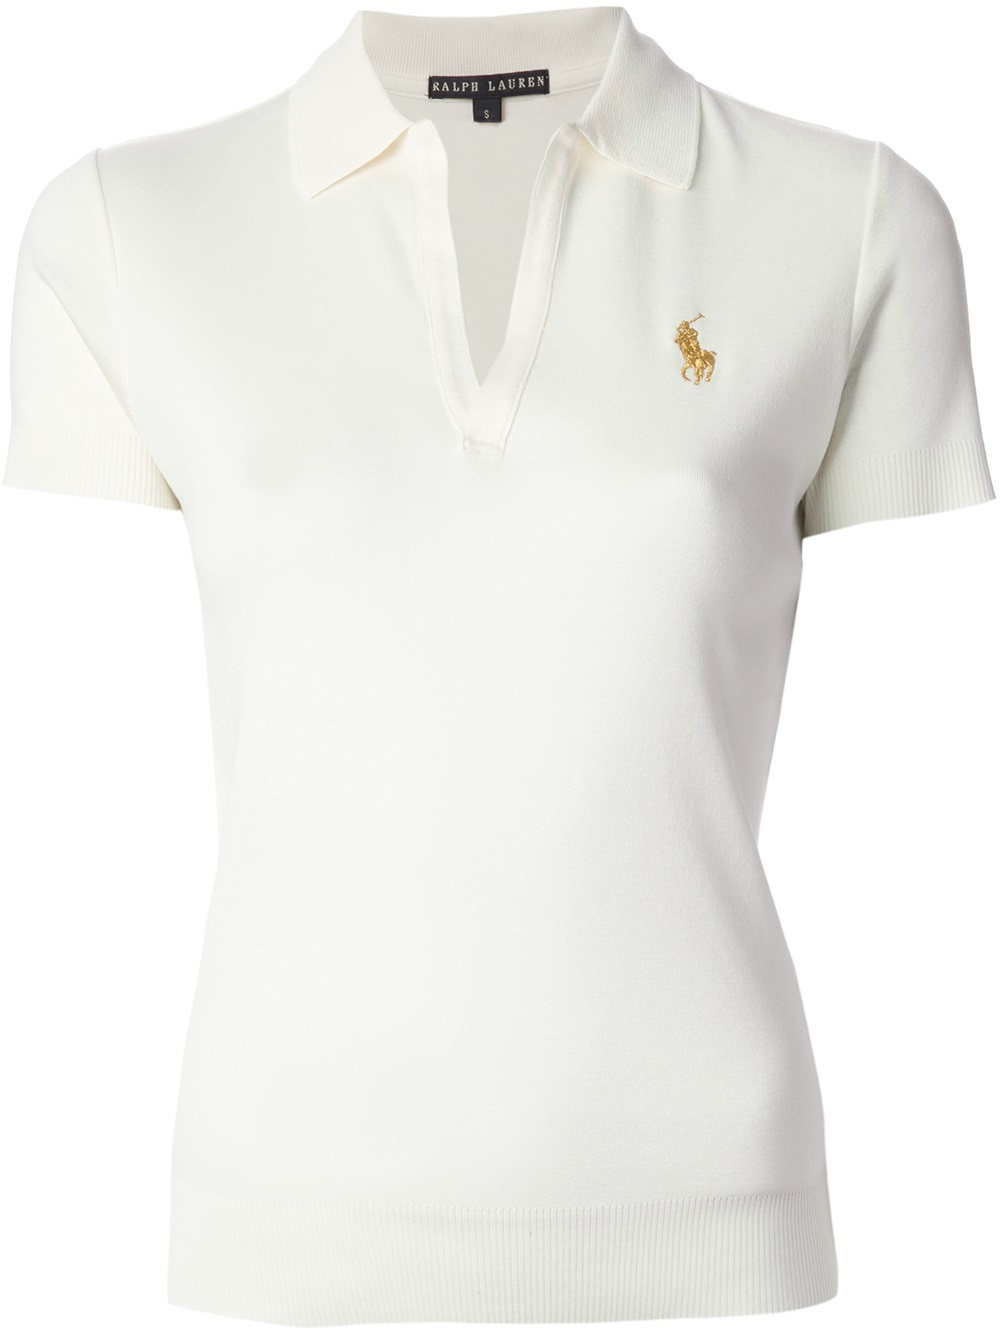 Lyst ralph lauren black label open placket polo shirt in for Ralph lauren black label polo shirt